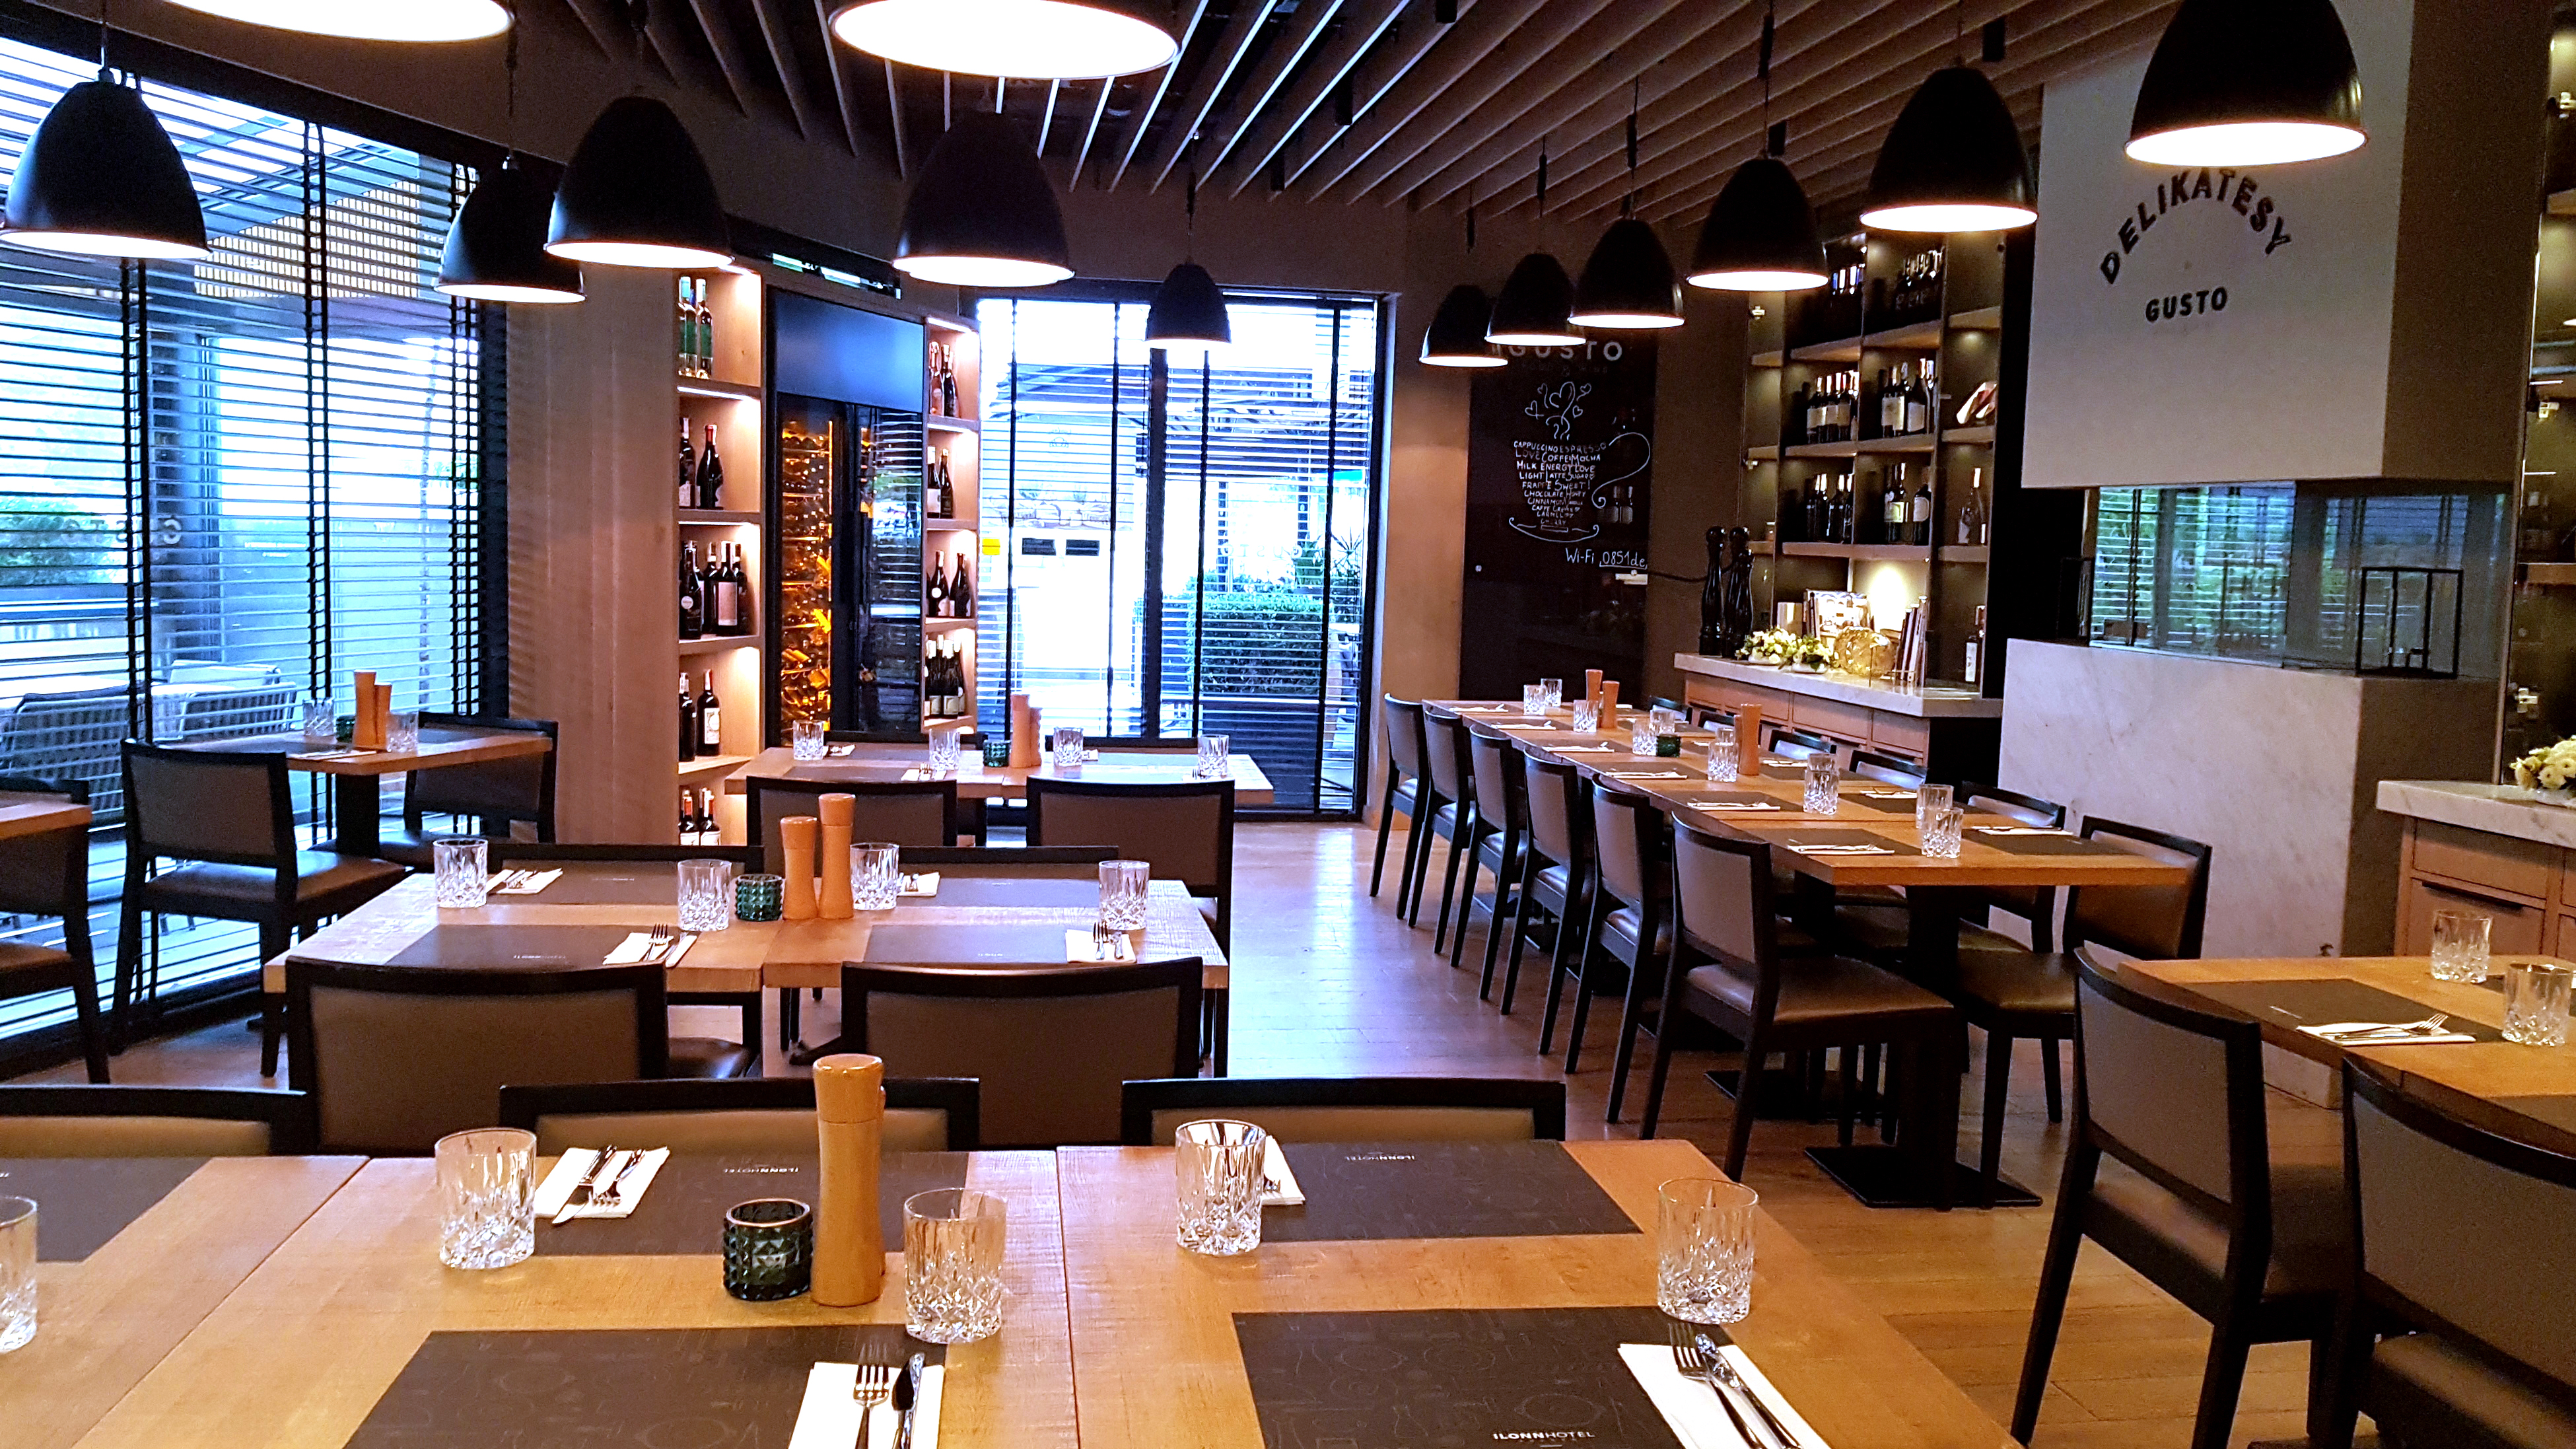 Restauracja Gusto w Ilonn Hotel